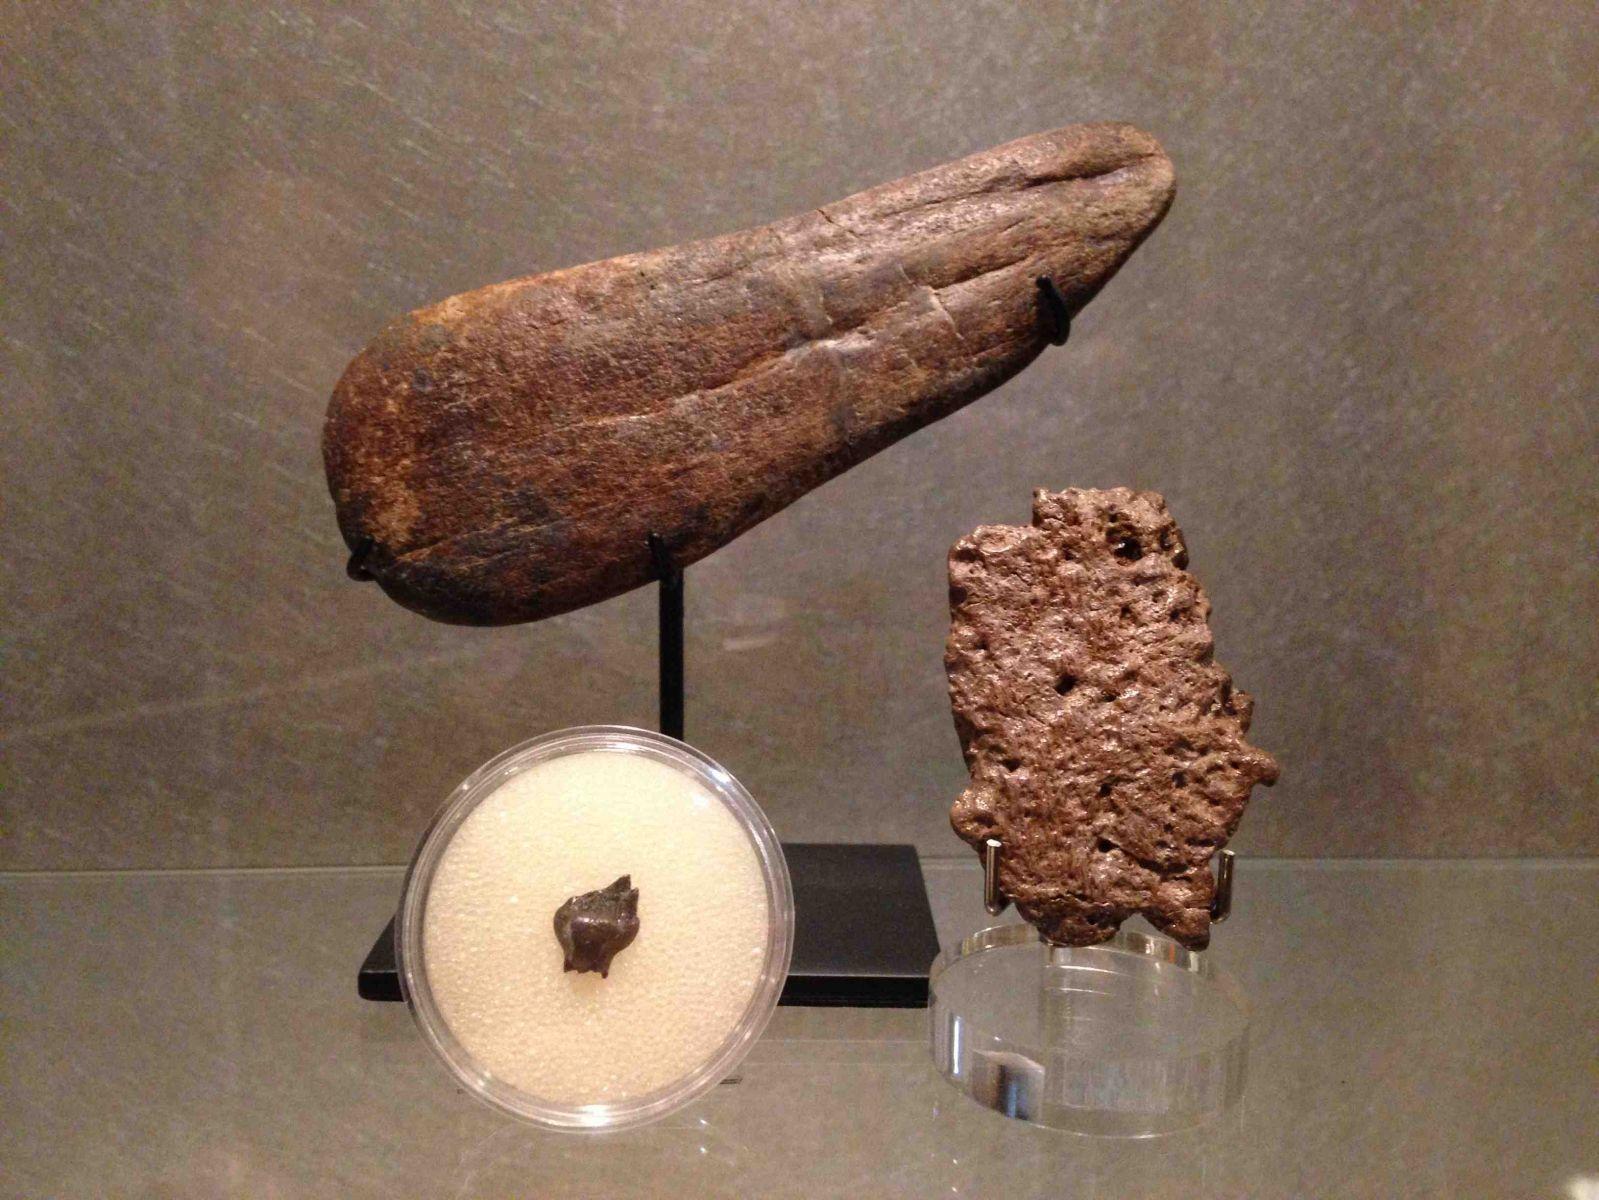 Ankylosaur Collection